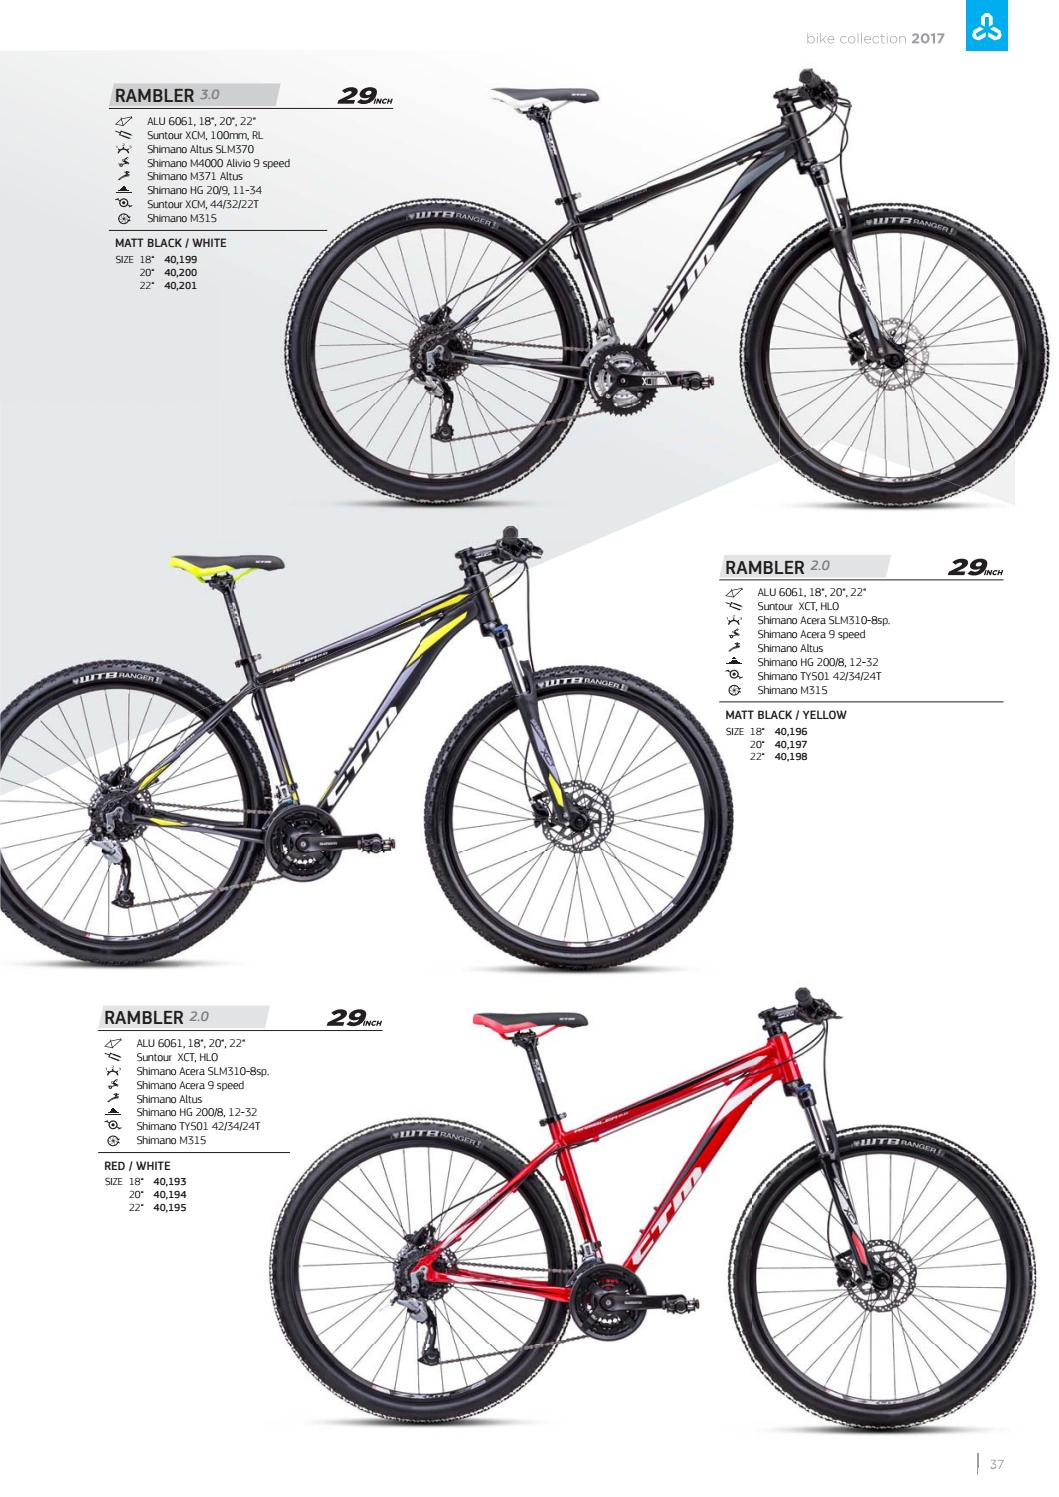 Ctm 2017 Catalogue By Bikes Issuu Groupset Alivio 9 Speed M4000